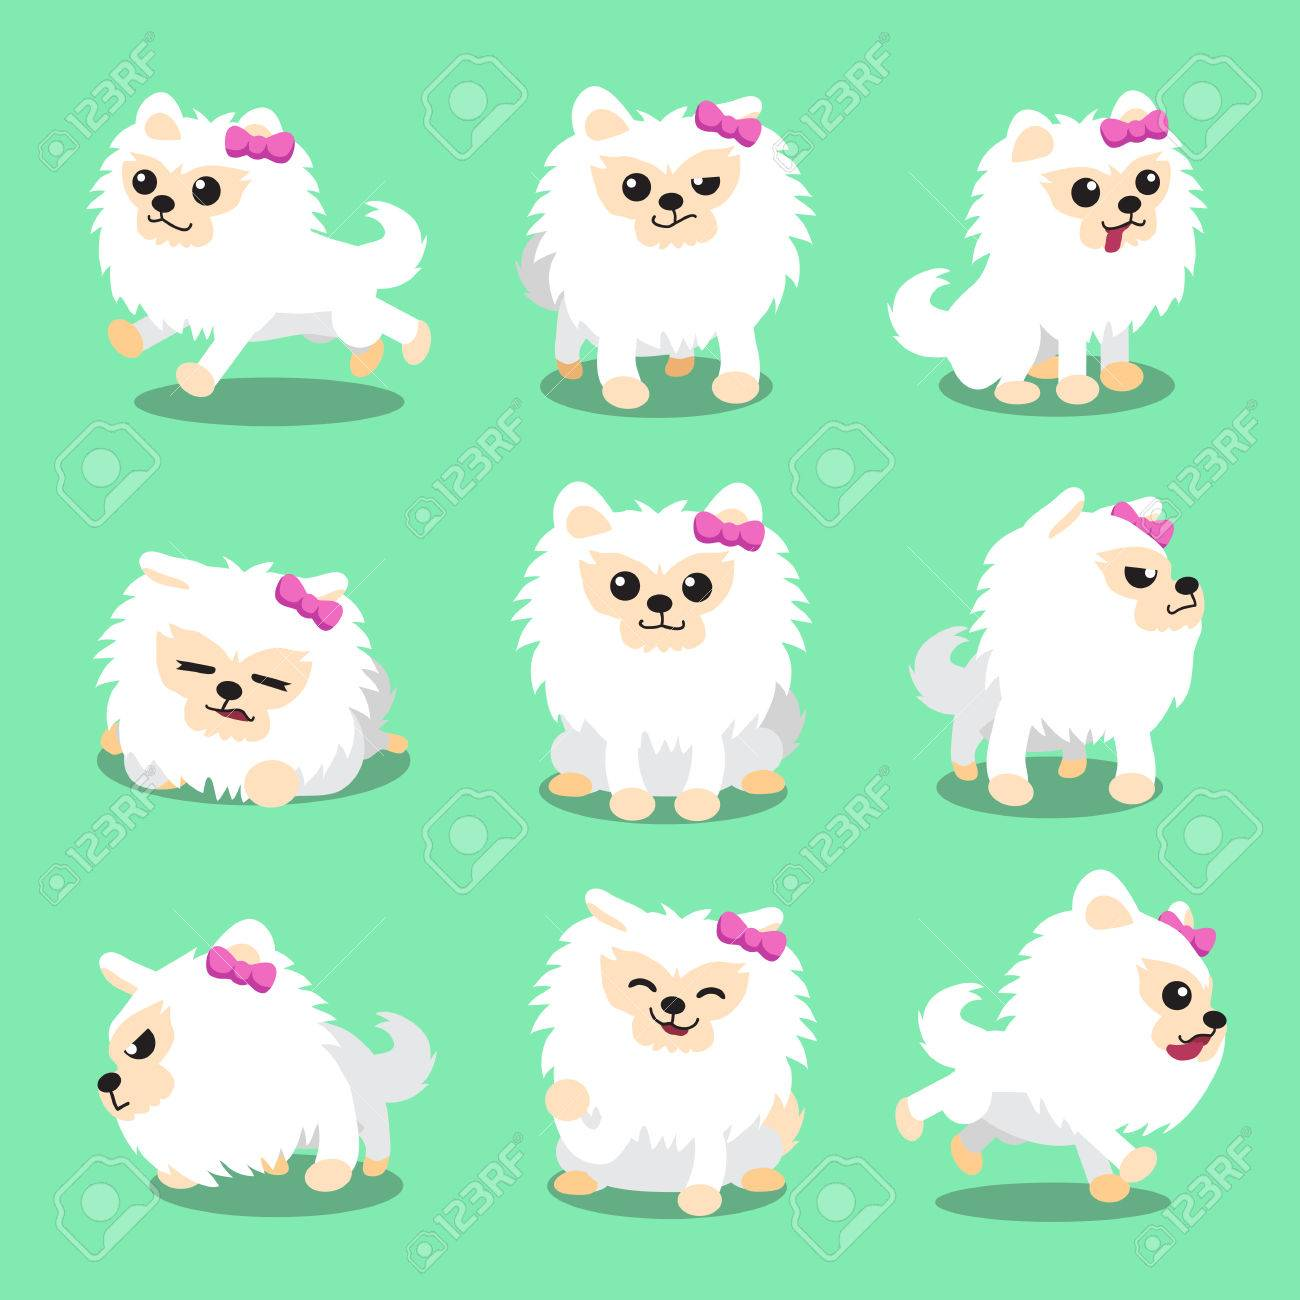 Cartoon Character White Pomeranian Dog Poses Royalty Free Cliparts Vectors And Stock Illustration Image 47275166